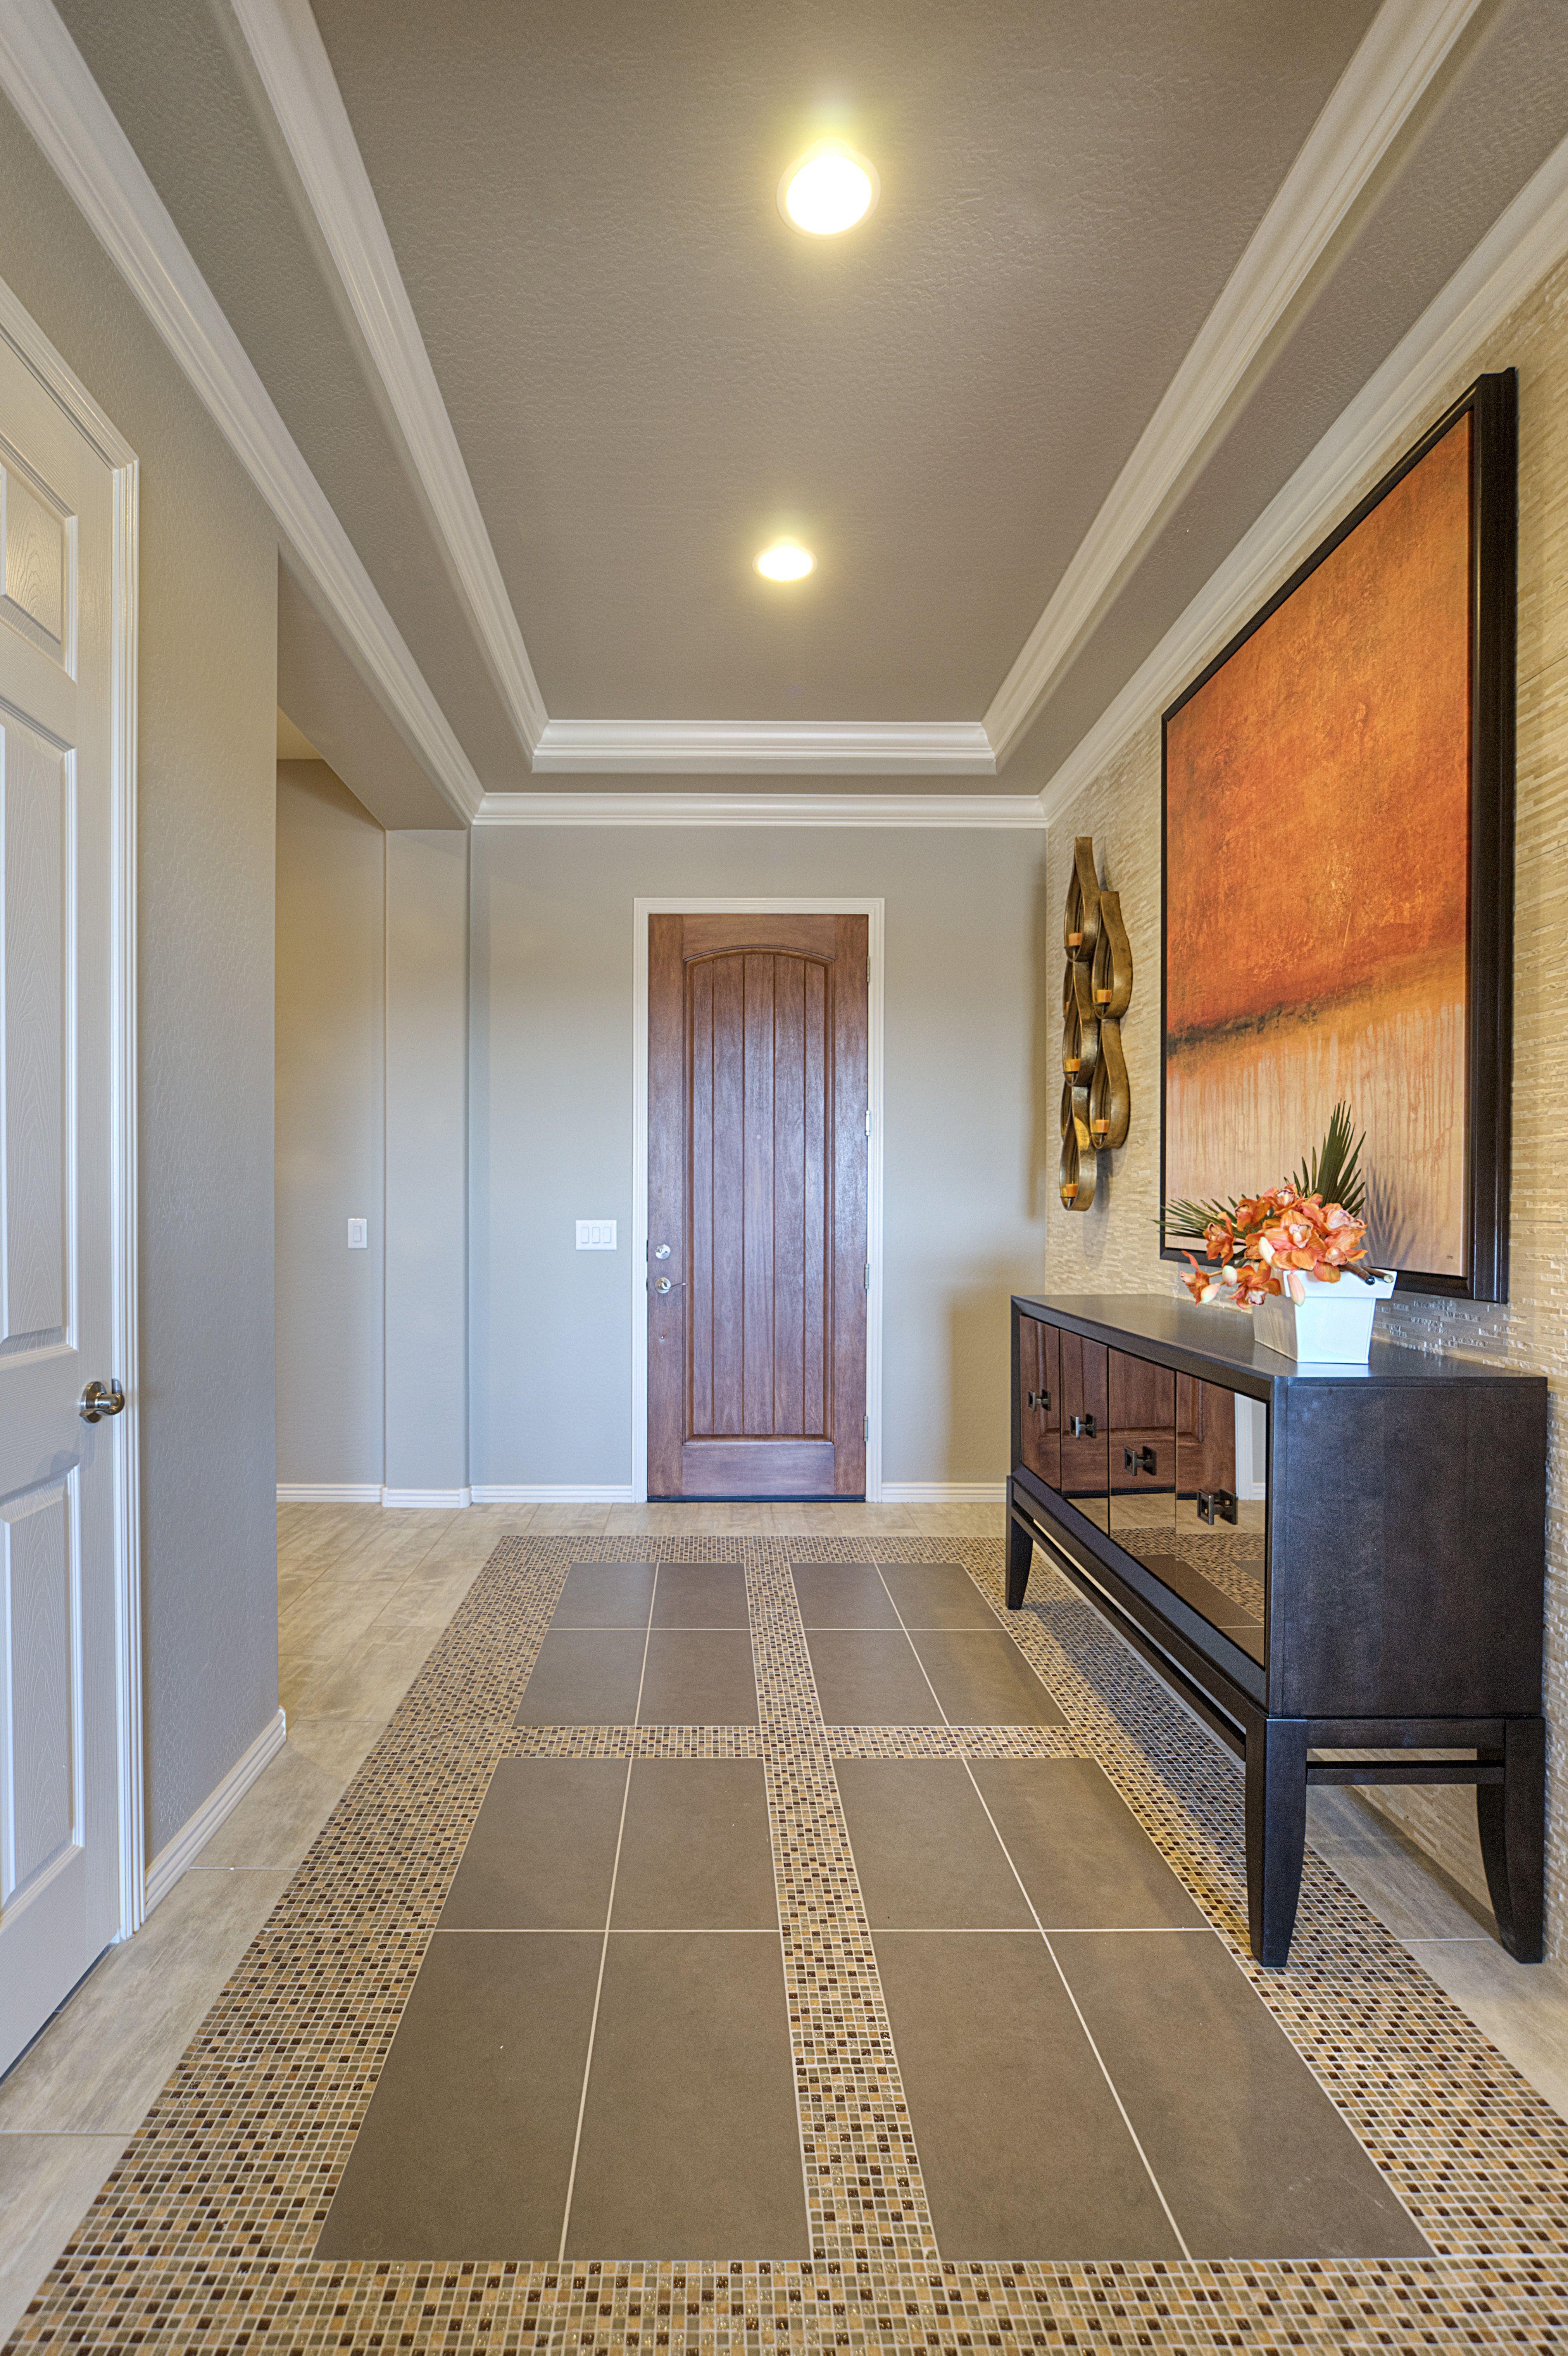 Tray Ceiling Gehan Homes Entryway Tiled Flooring Tray Ceiling Medium Wooden